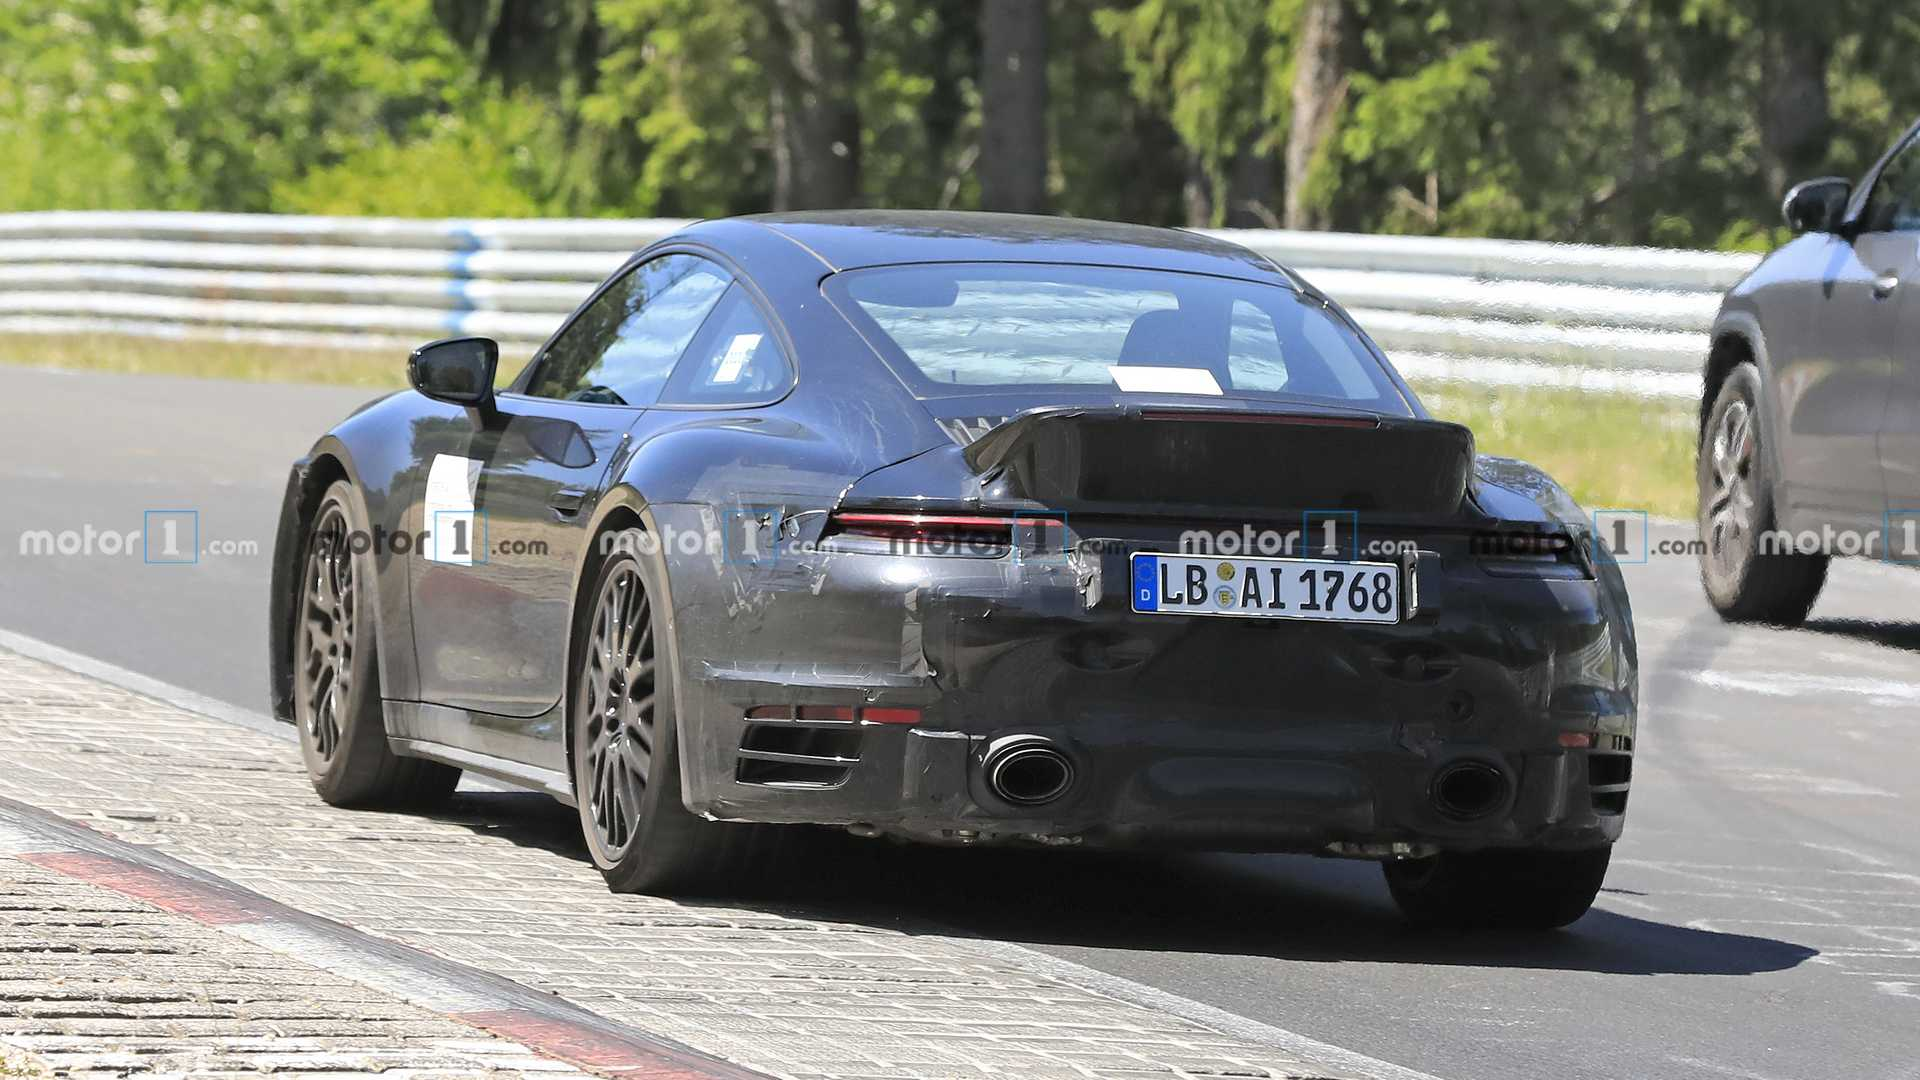 2018 - [Porsche] 911 - Page 20 Porsche-911-turbo-sport-classic-spy-photo